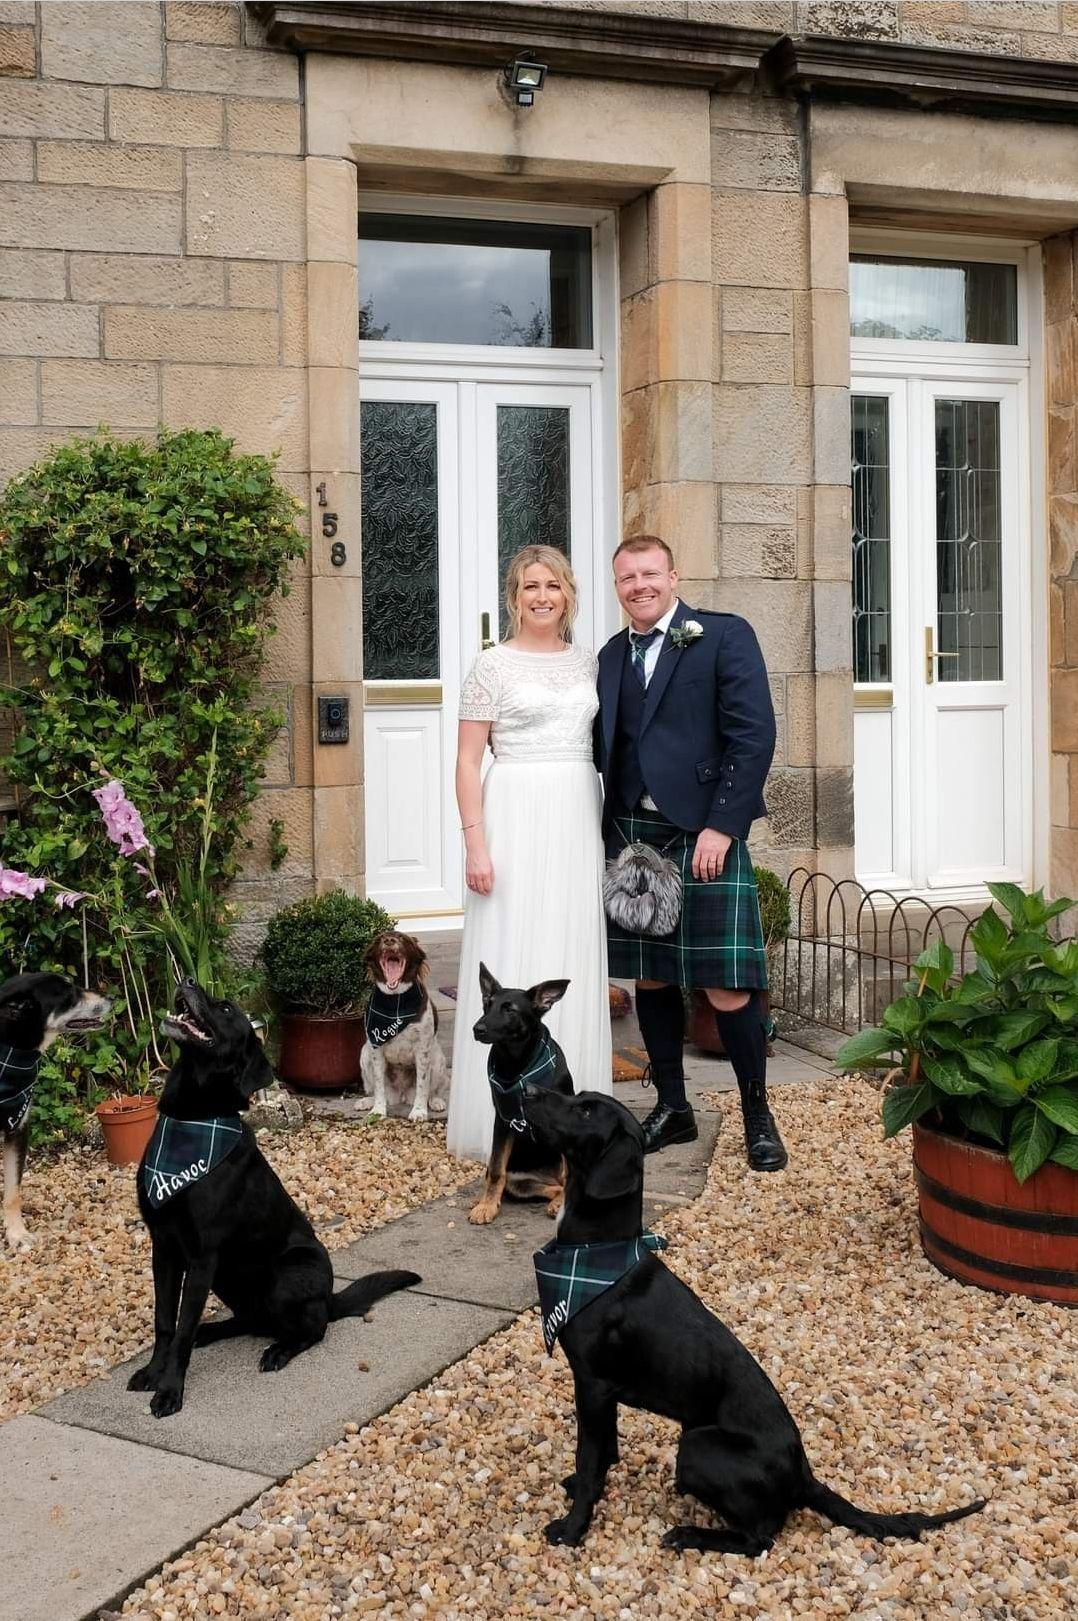 Scottish wedding inspiration, dogs at wedding